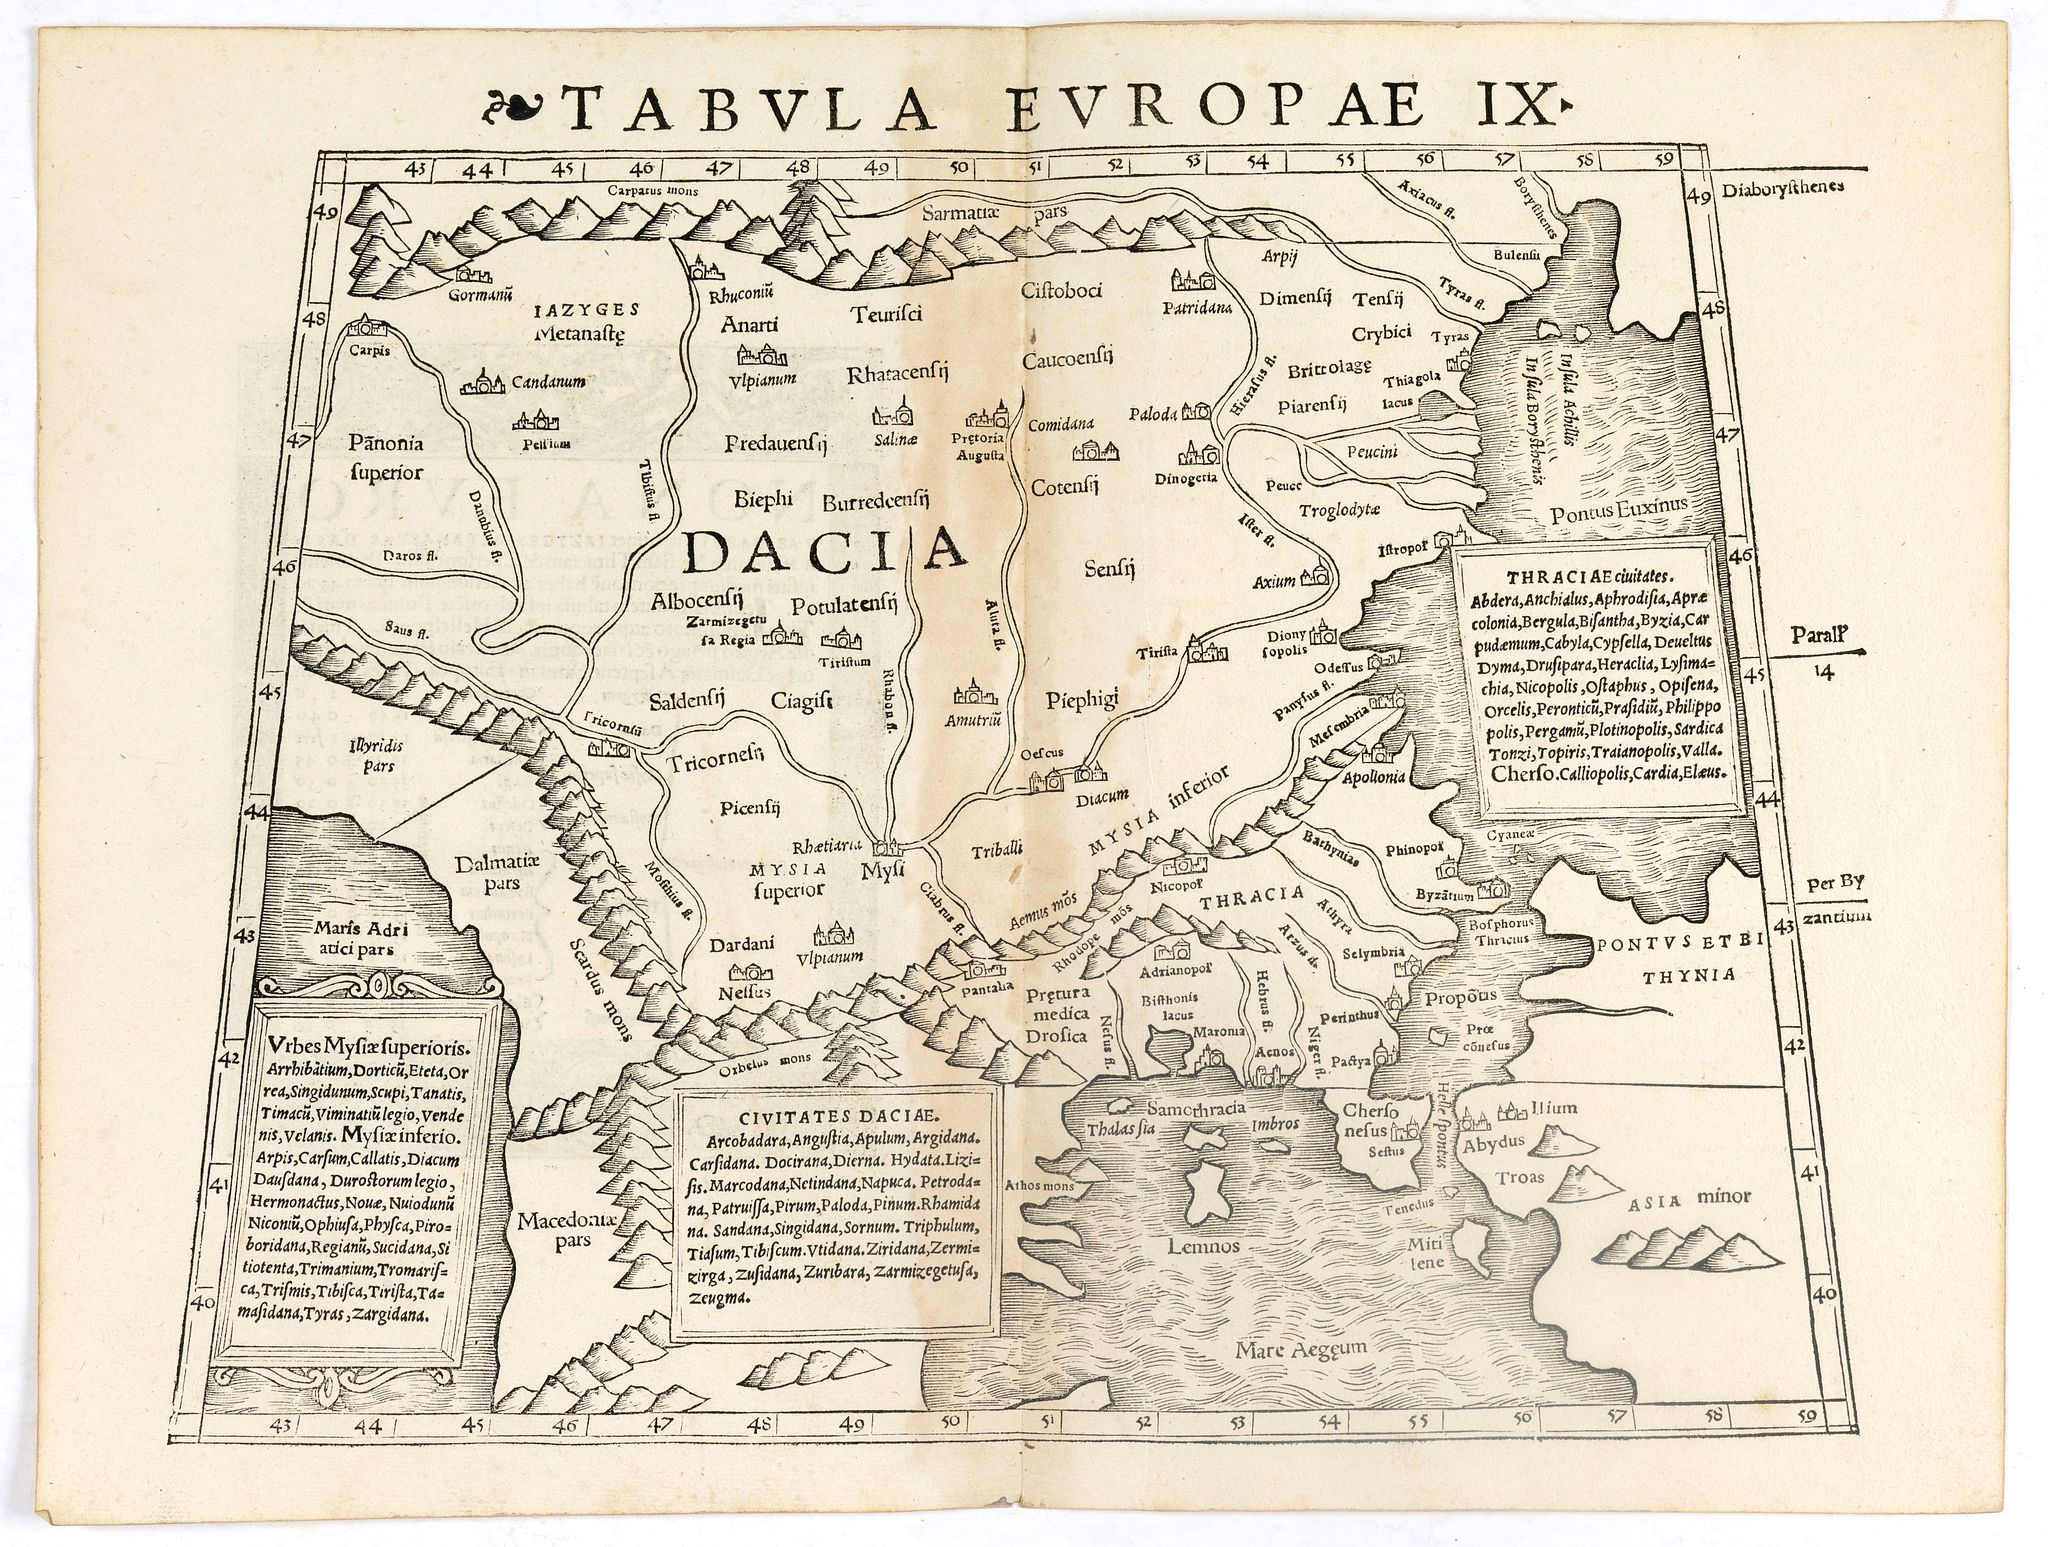 MÜNSTER, S. -  Tabula Europae IX ( Greece & Turkey).